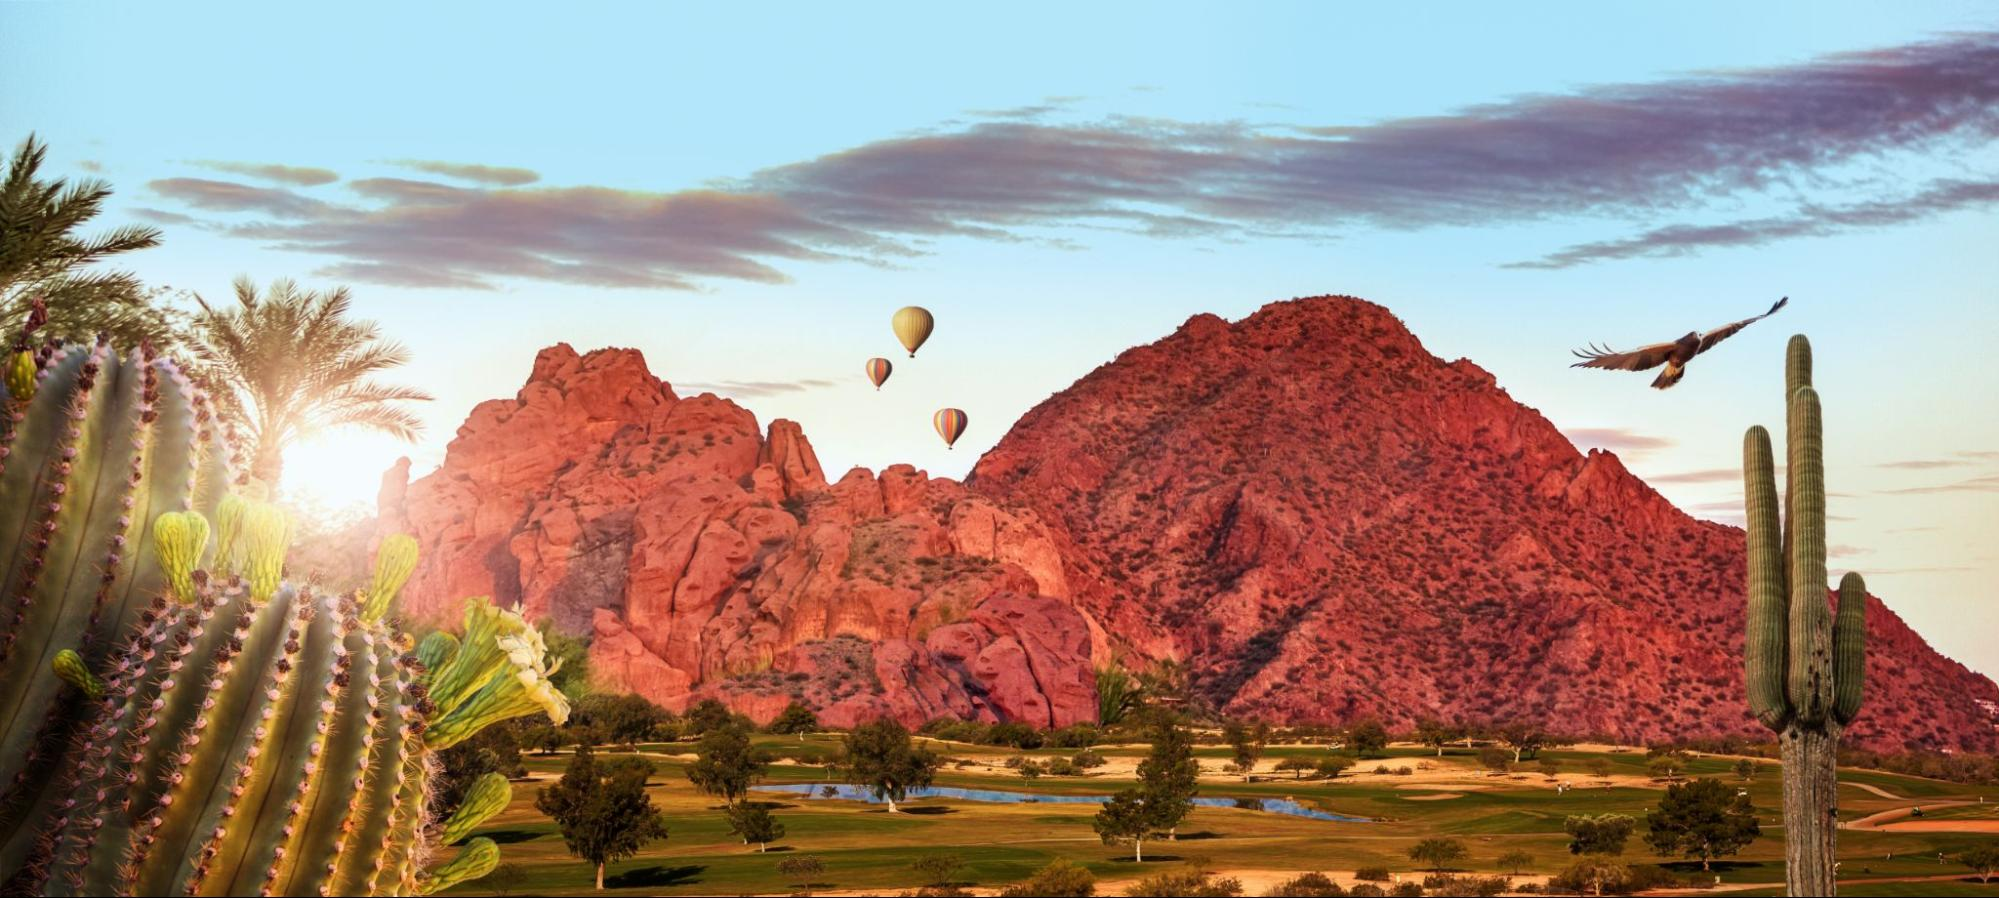 View of hot air balloons in Phoenix, Arizona